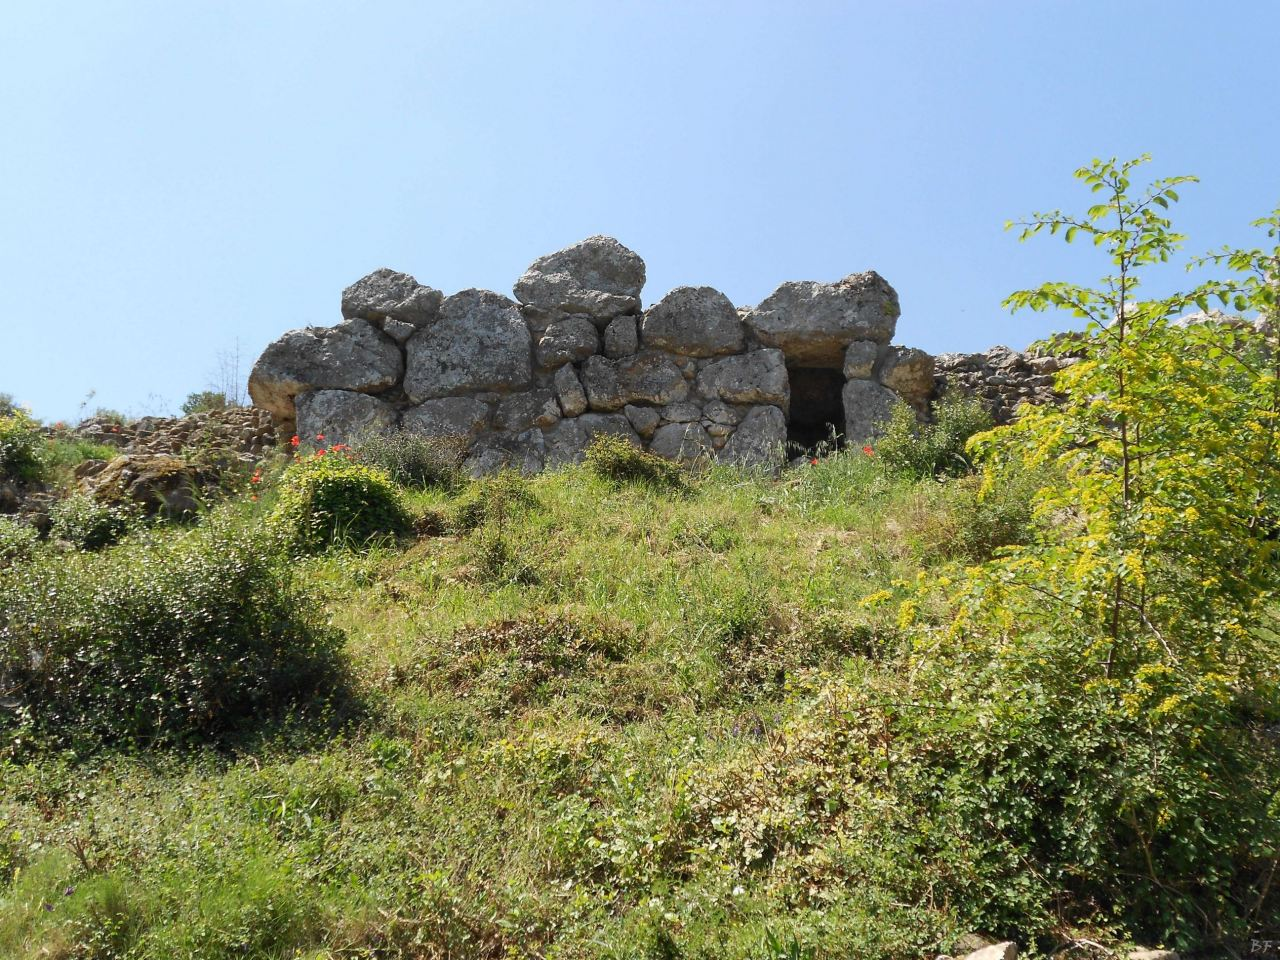 Roselle-Mura-Megalitiche-Roselle-Grosseto-Toscana-Italia-27